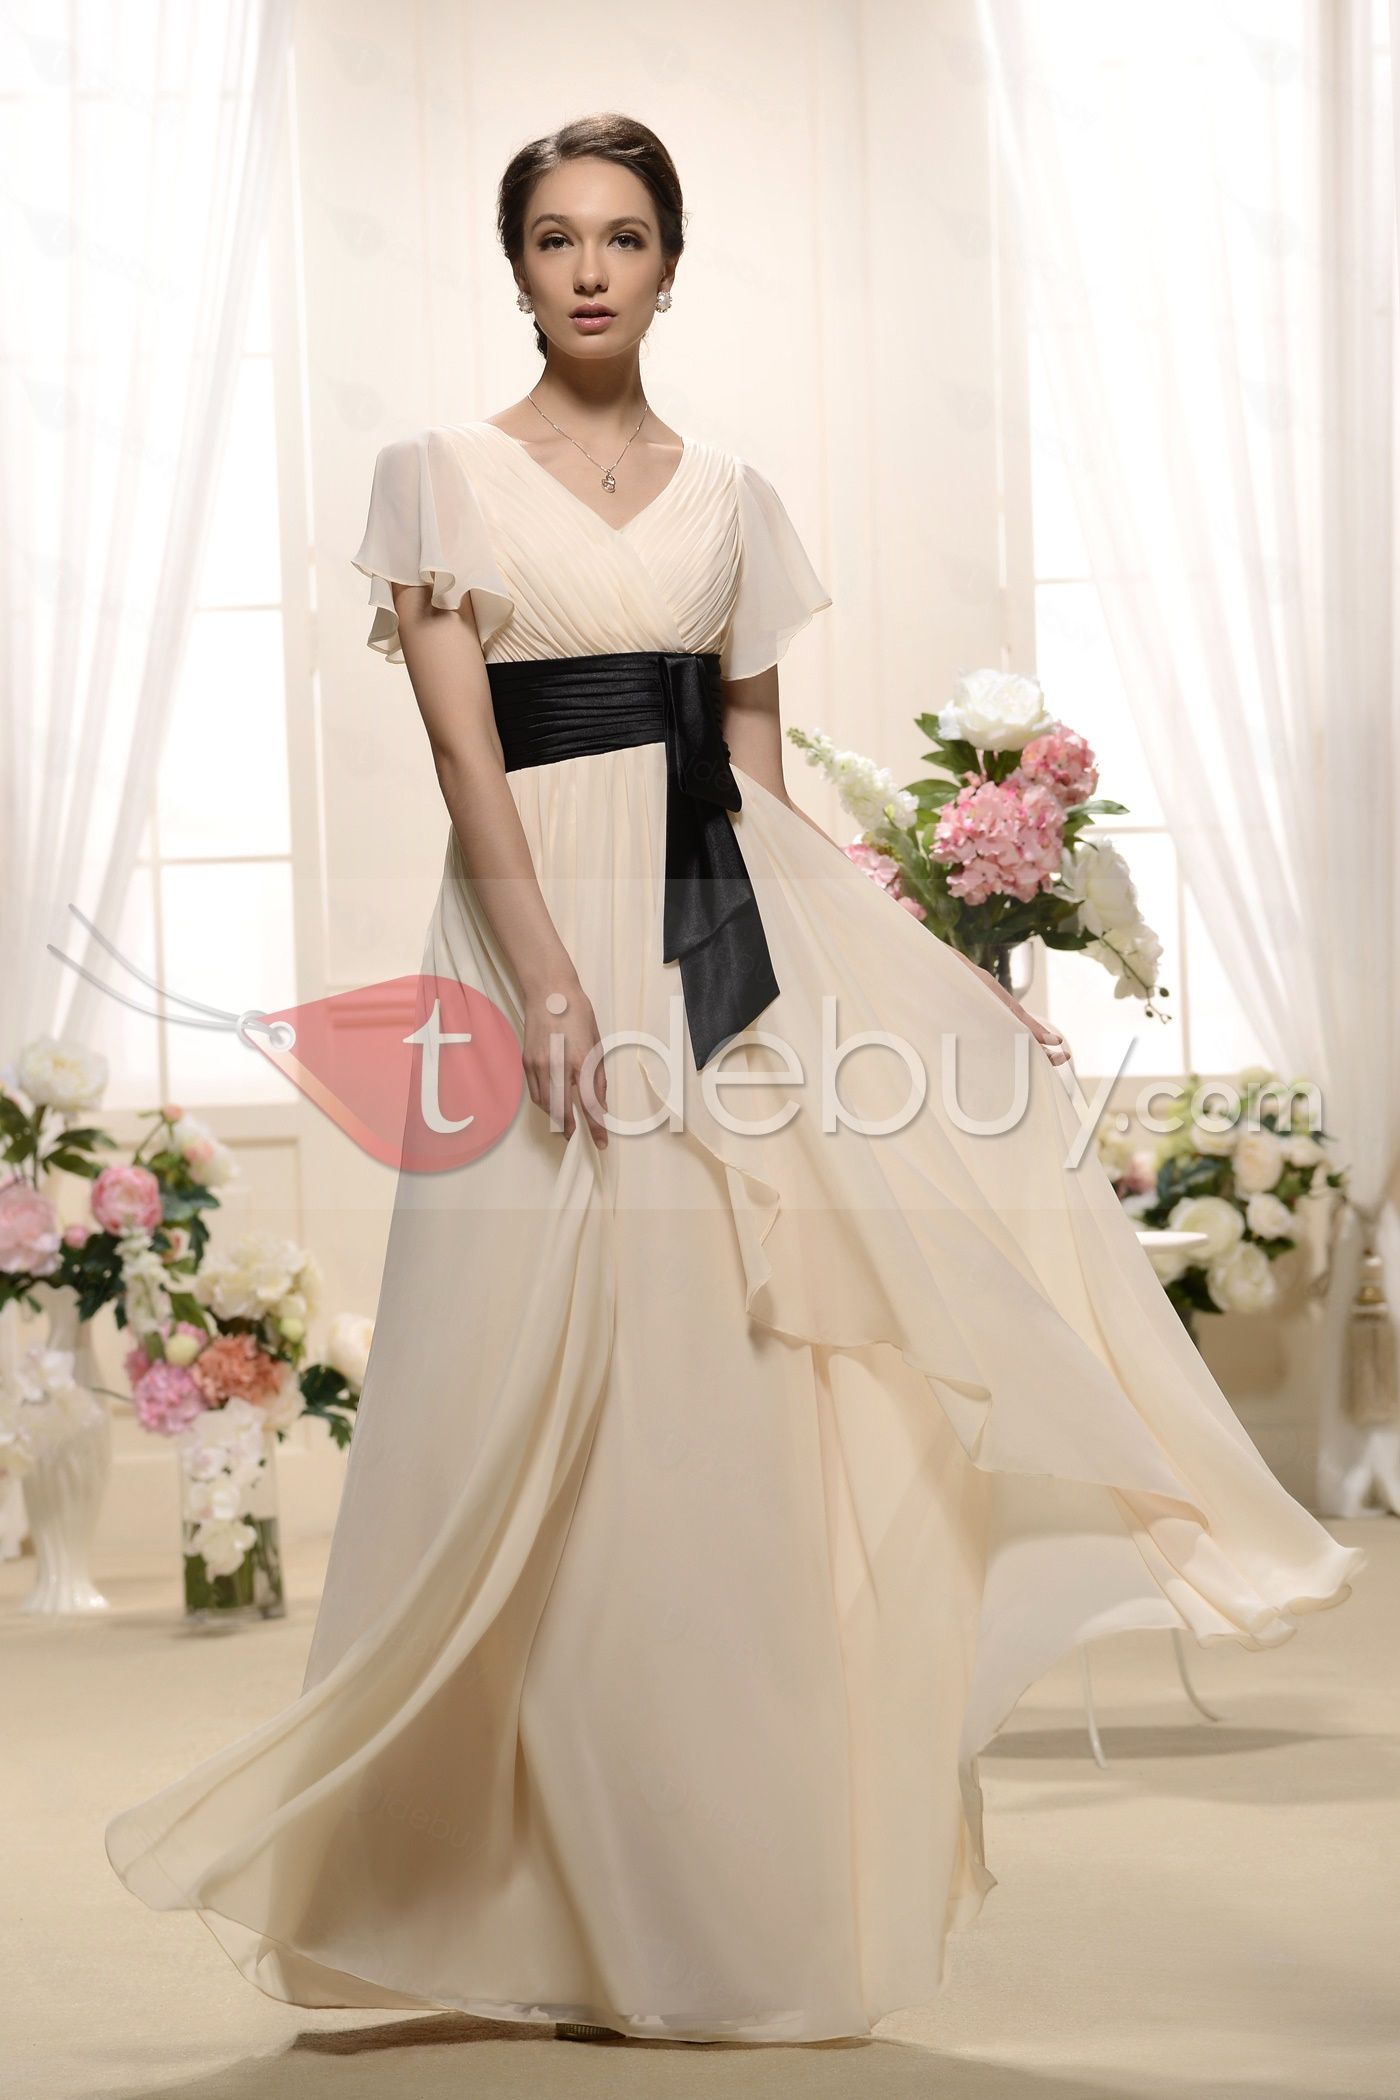 Unique ruffles aline vneck shortsleeves floorlength bridesmaid